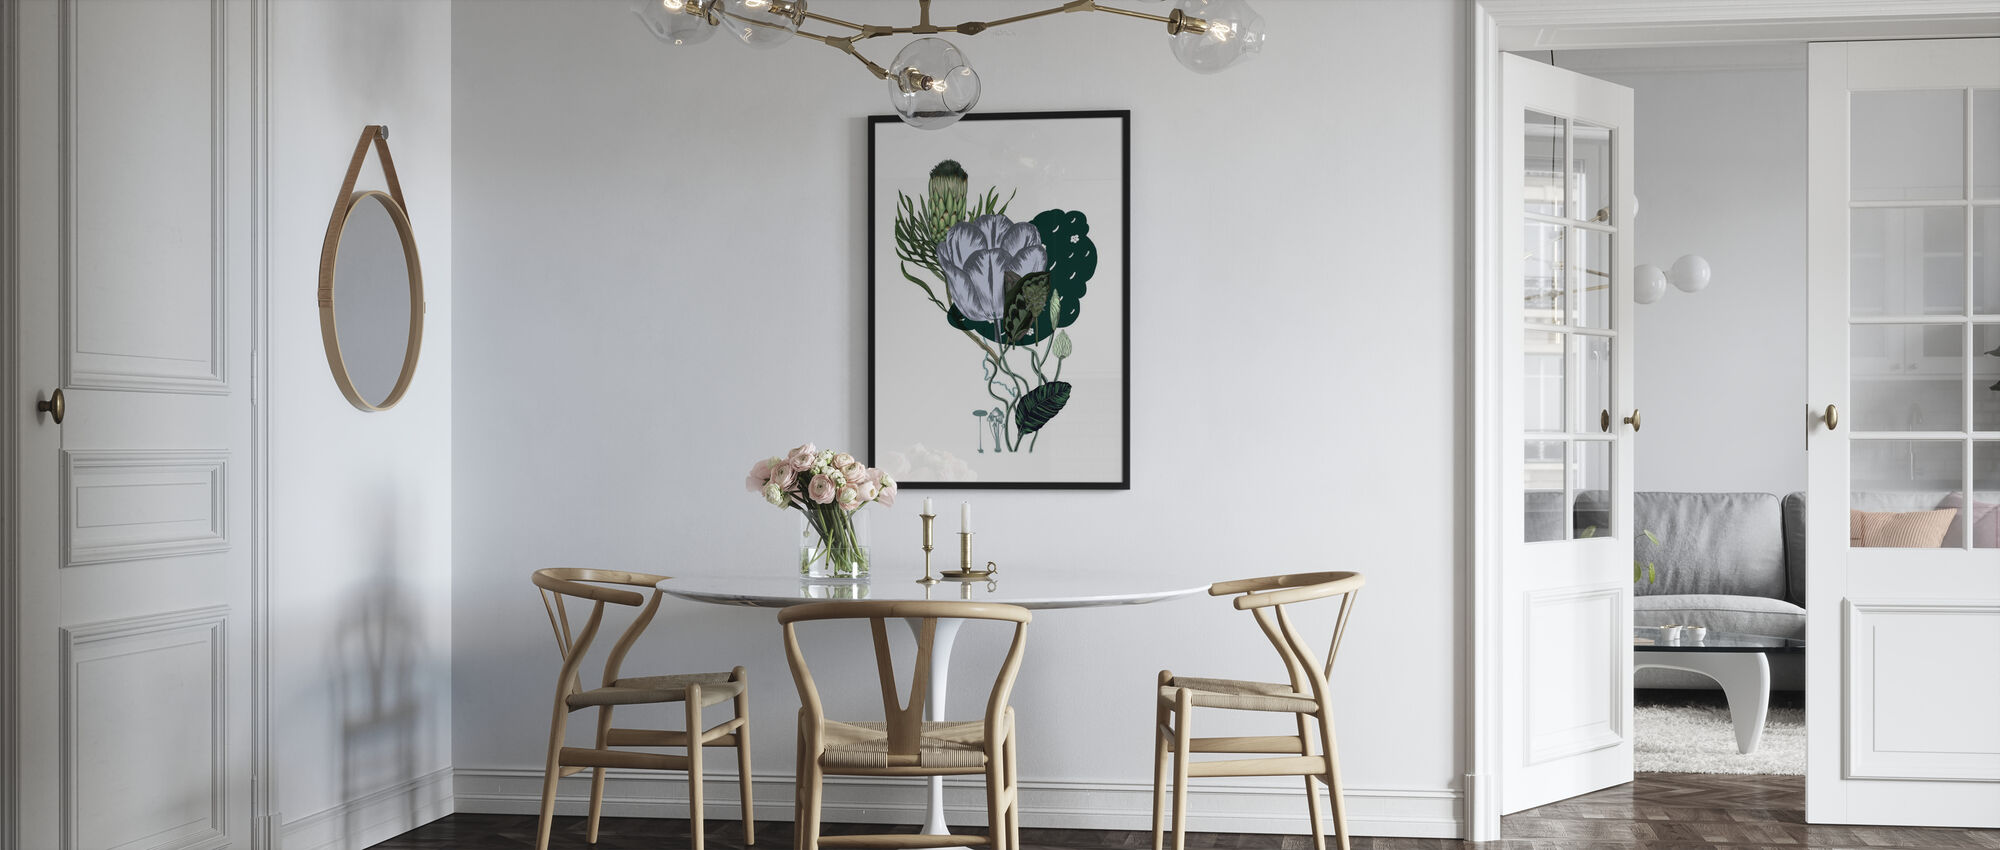 Artichoke Bouquet - Framed print - Kitchen